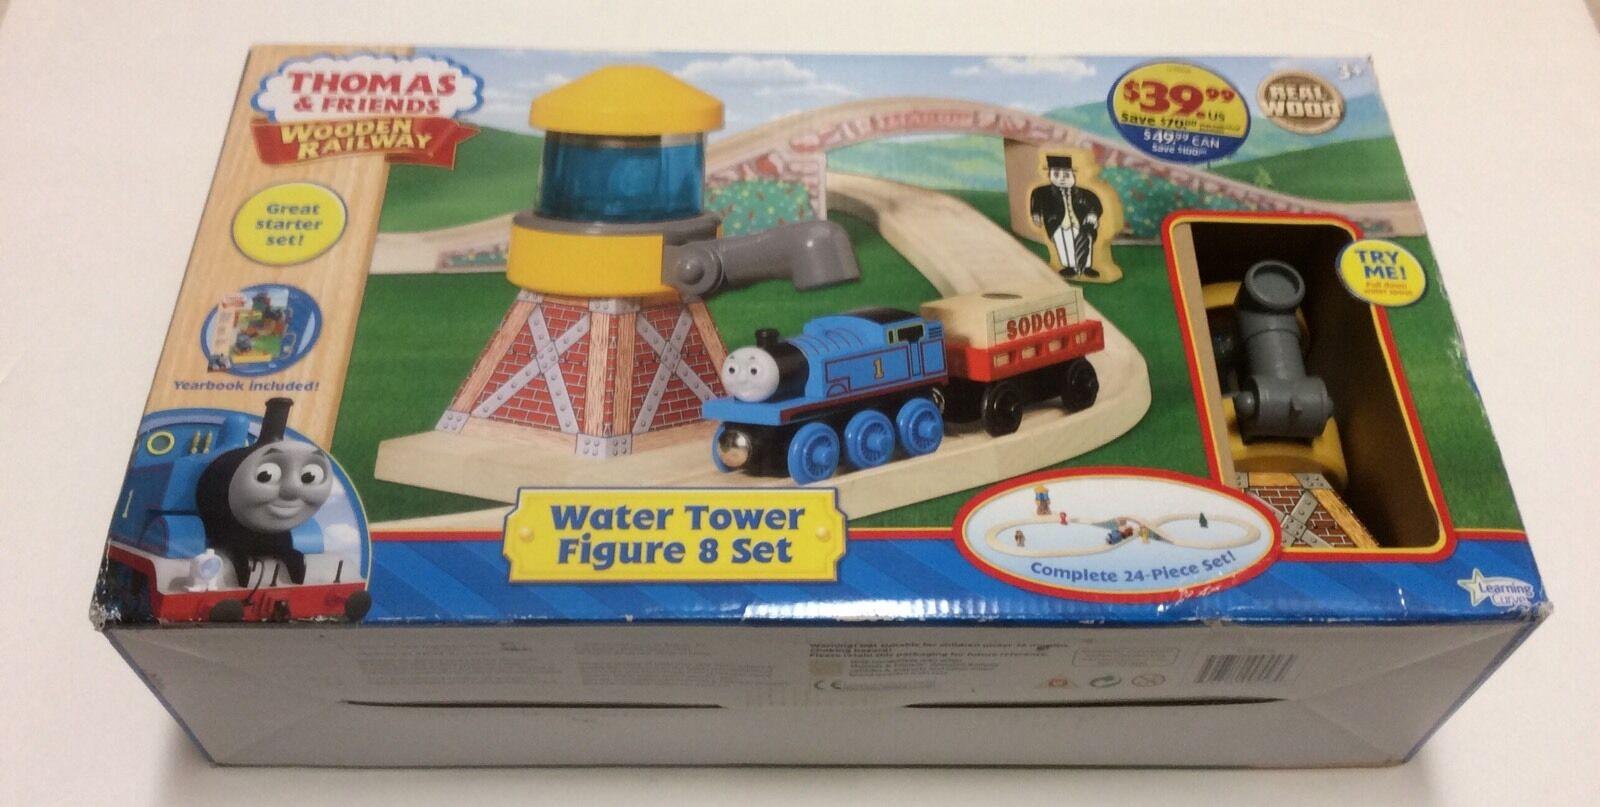 NEW Thomas & Friends Wooden Railway Water Tower Figure 8 Set Train Tracks